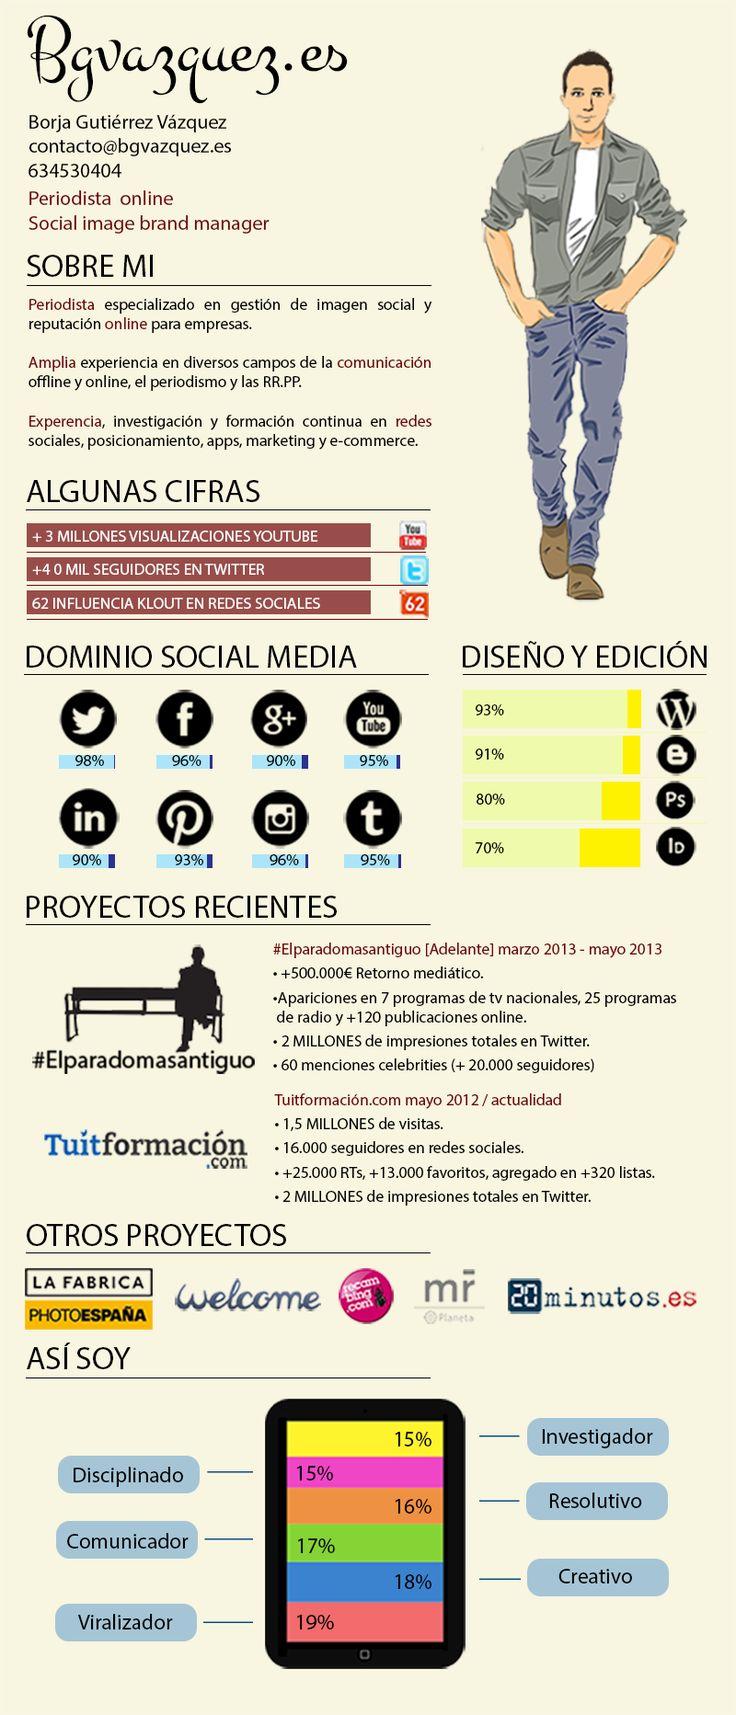 Mi currículum vitae en infografía. CV Infográfico. Bgvazquez. Borja Gutiérrez Vázquez. Periodista y Social image brand manager especializado en SEM.